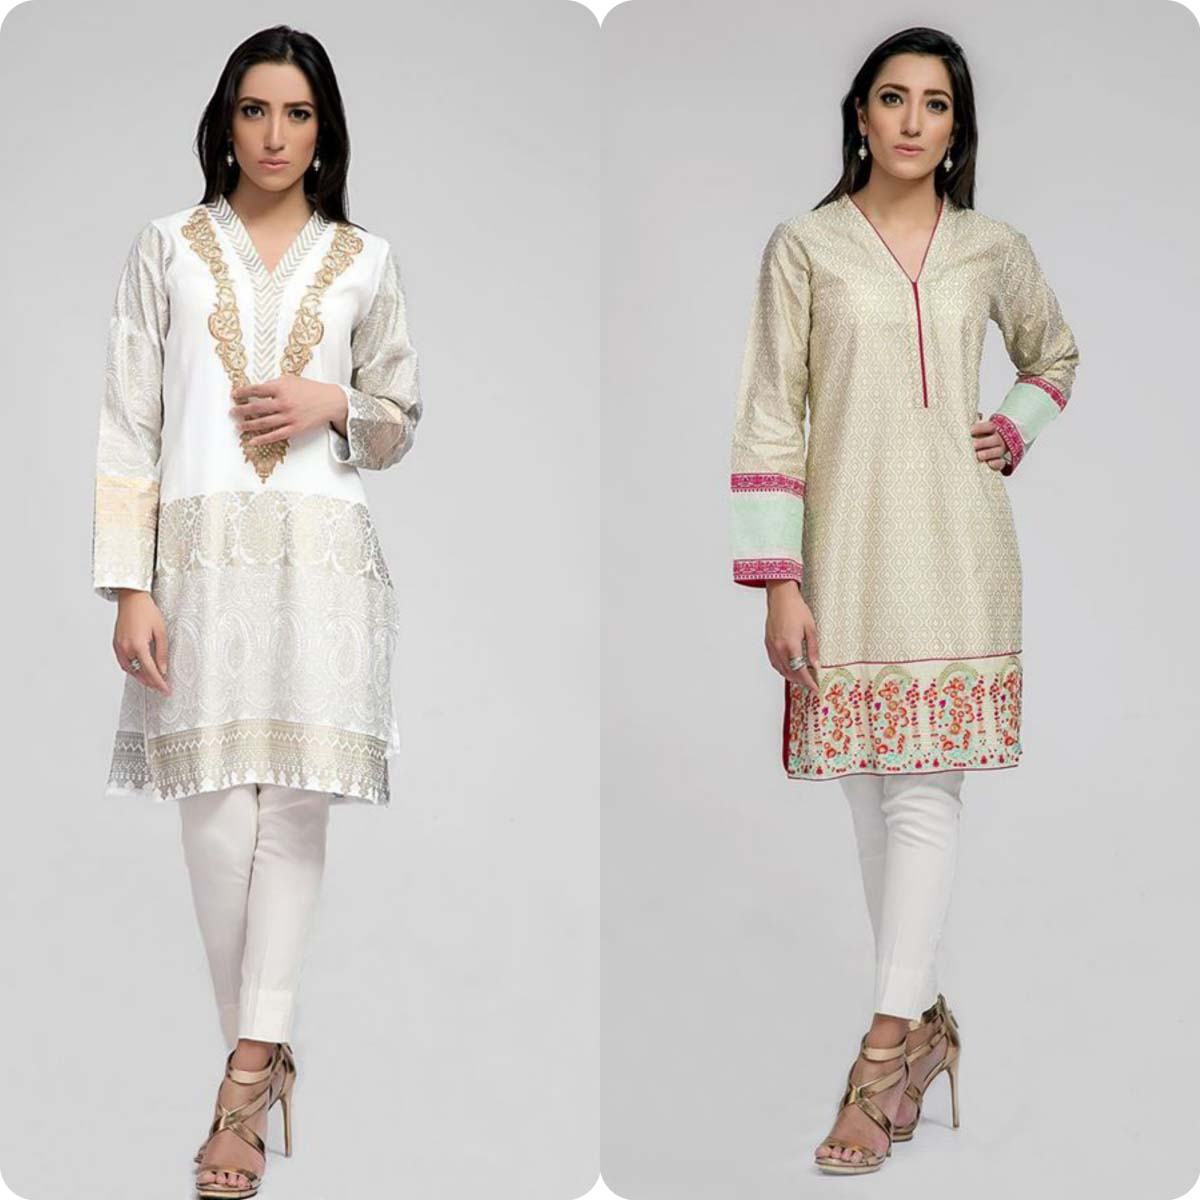 Deepak perwani Luxury Pret Eid Collection for Men and Women 2016-2017 (6)